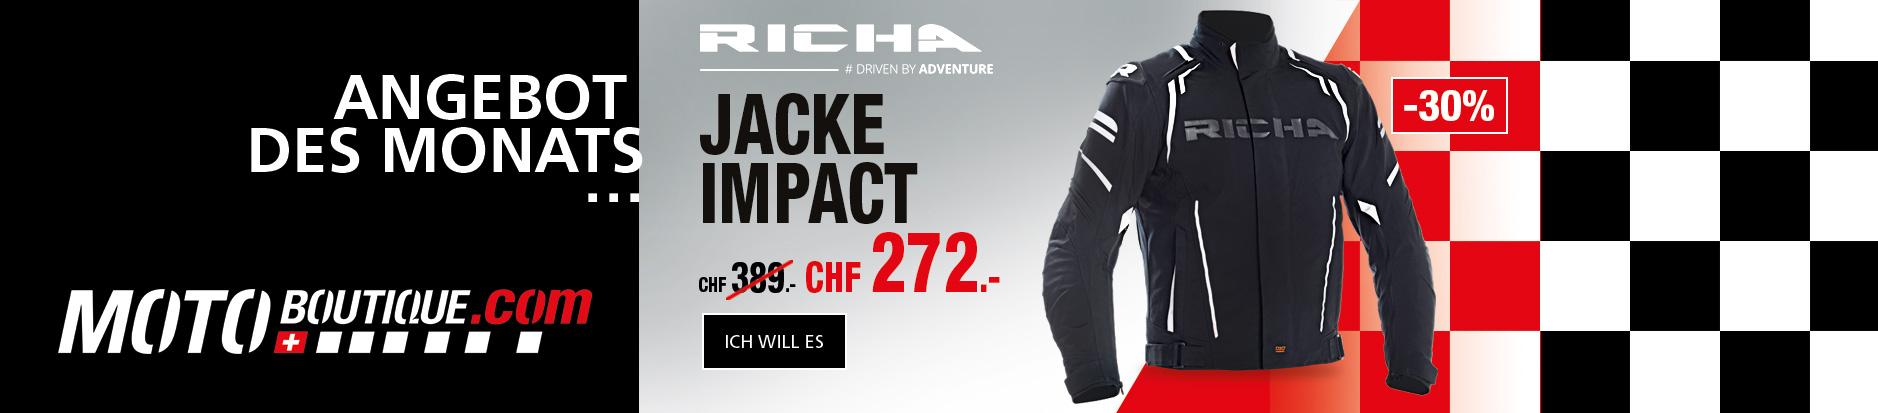 Richa Jacke Impact